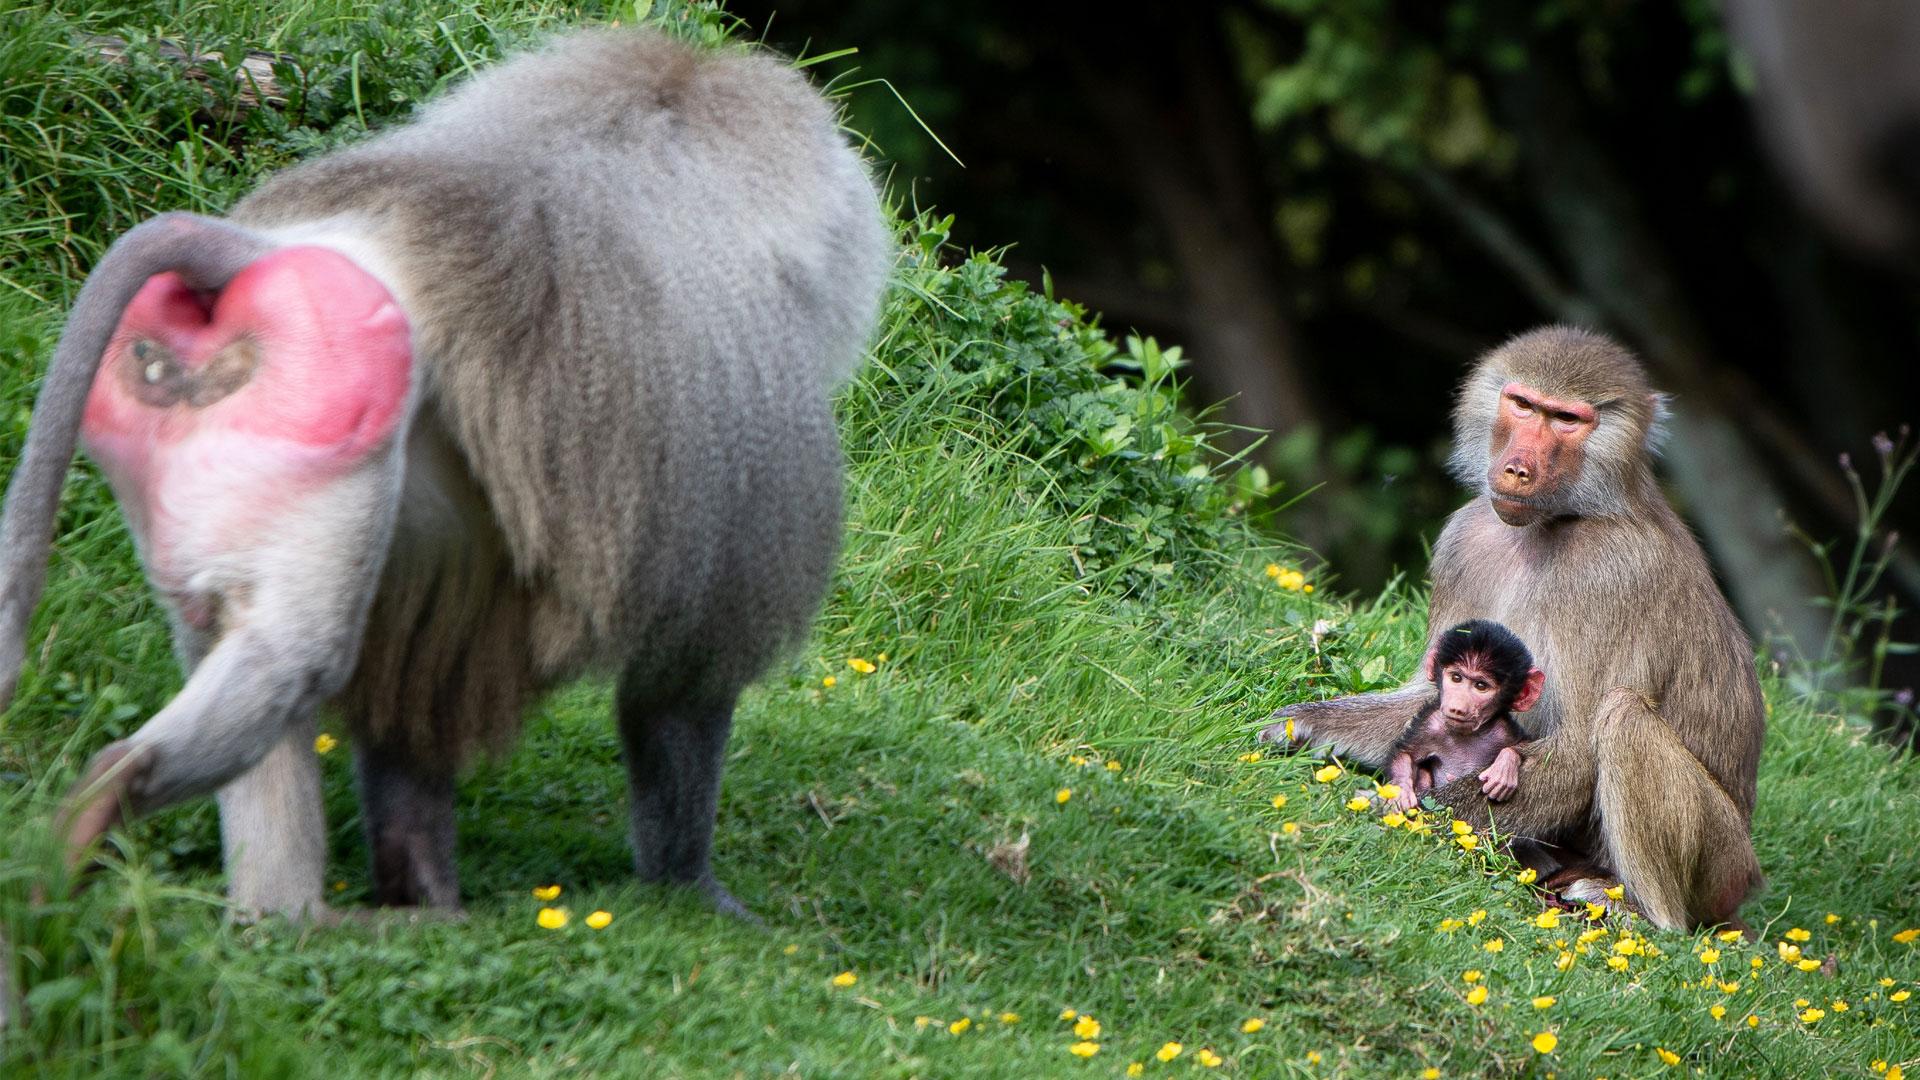 https://rfacdn.nz/zoo/assets/media/baboon-baby-gallery-2.jpg